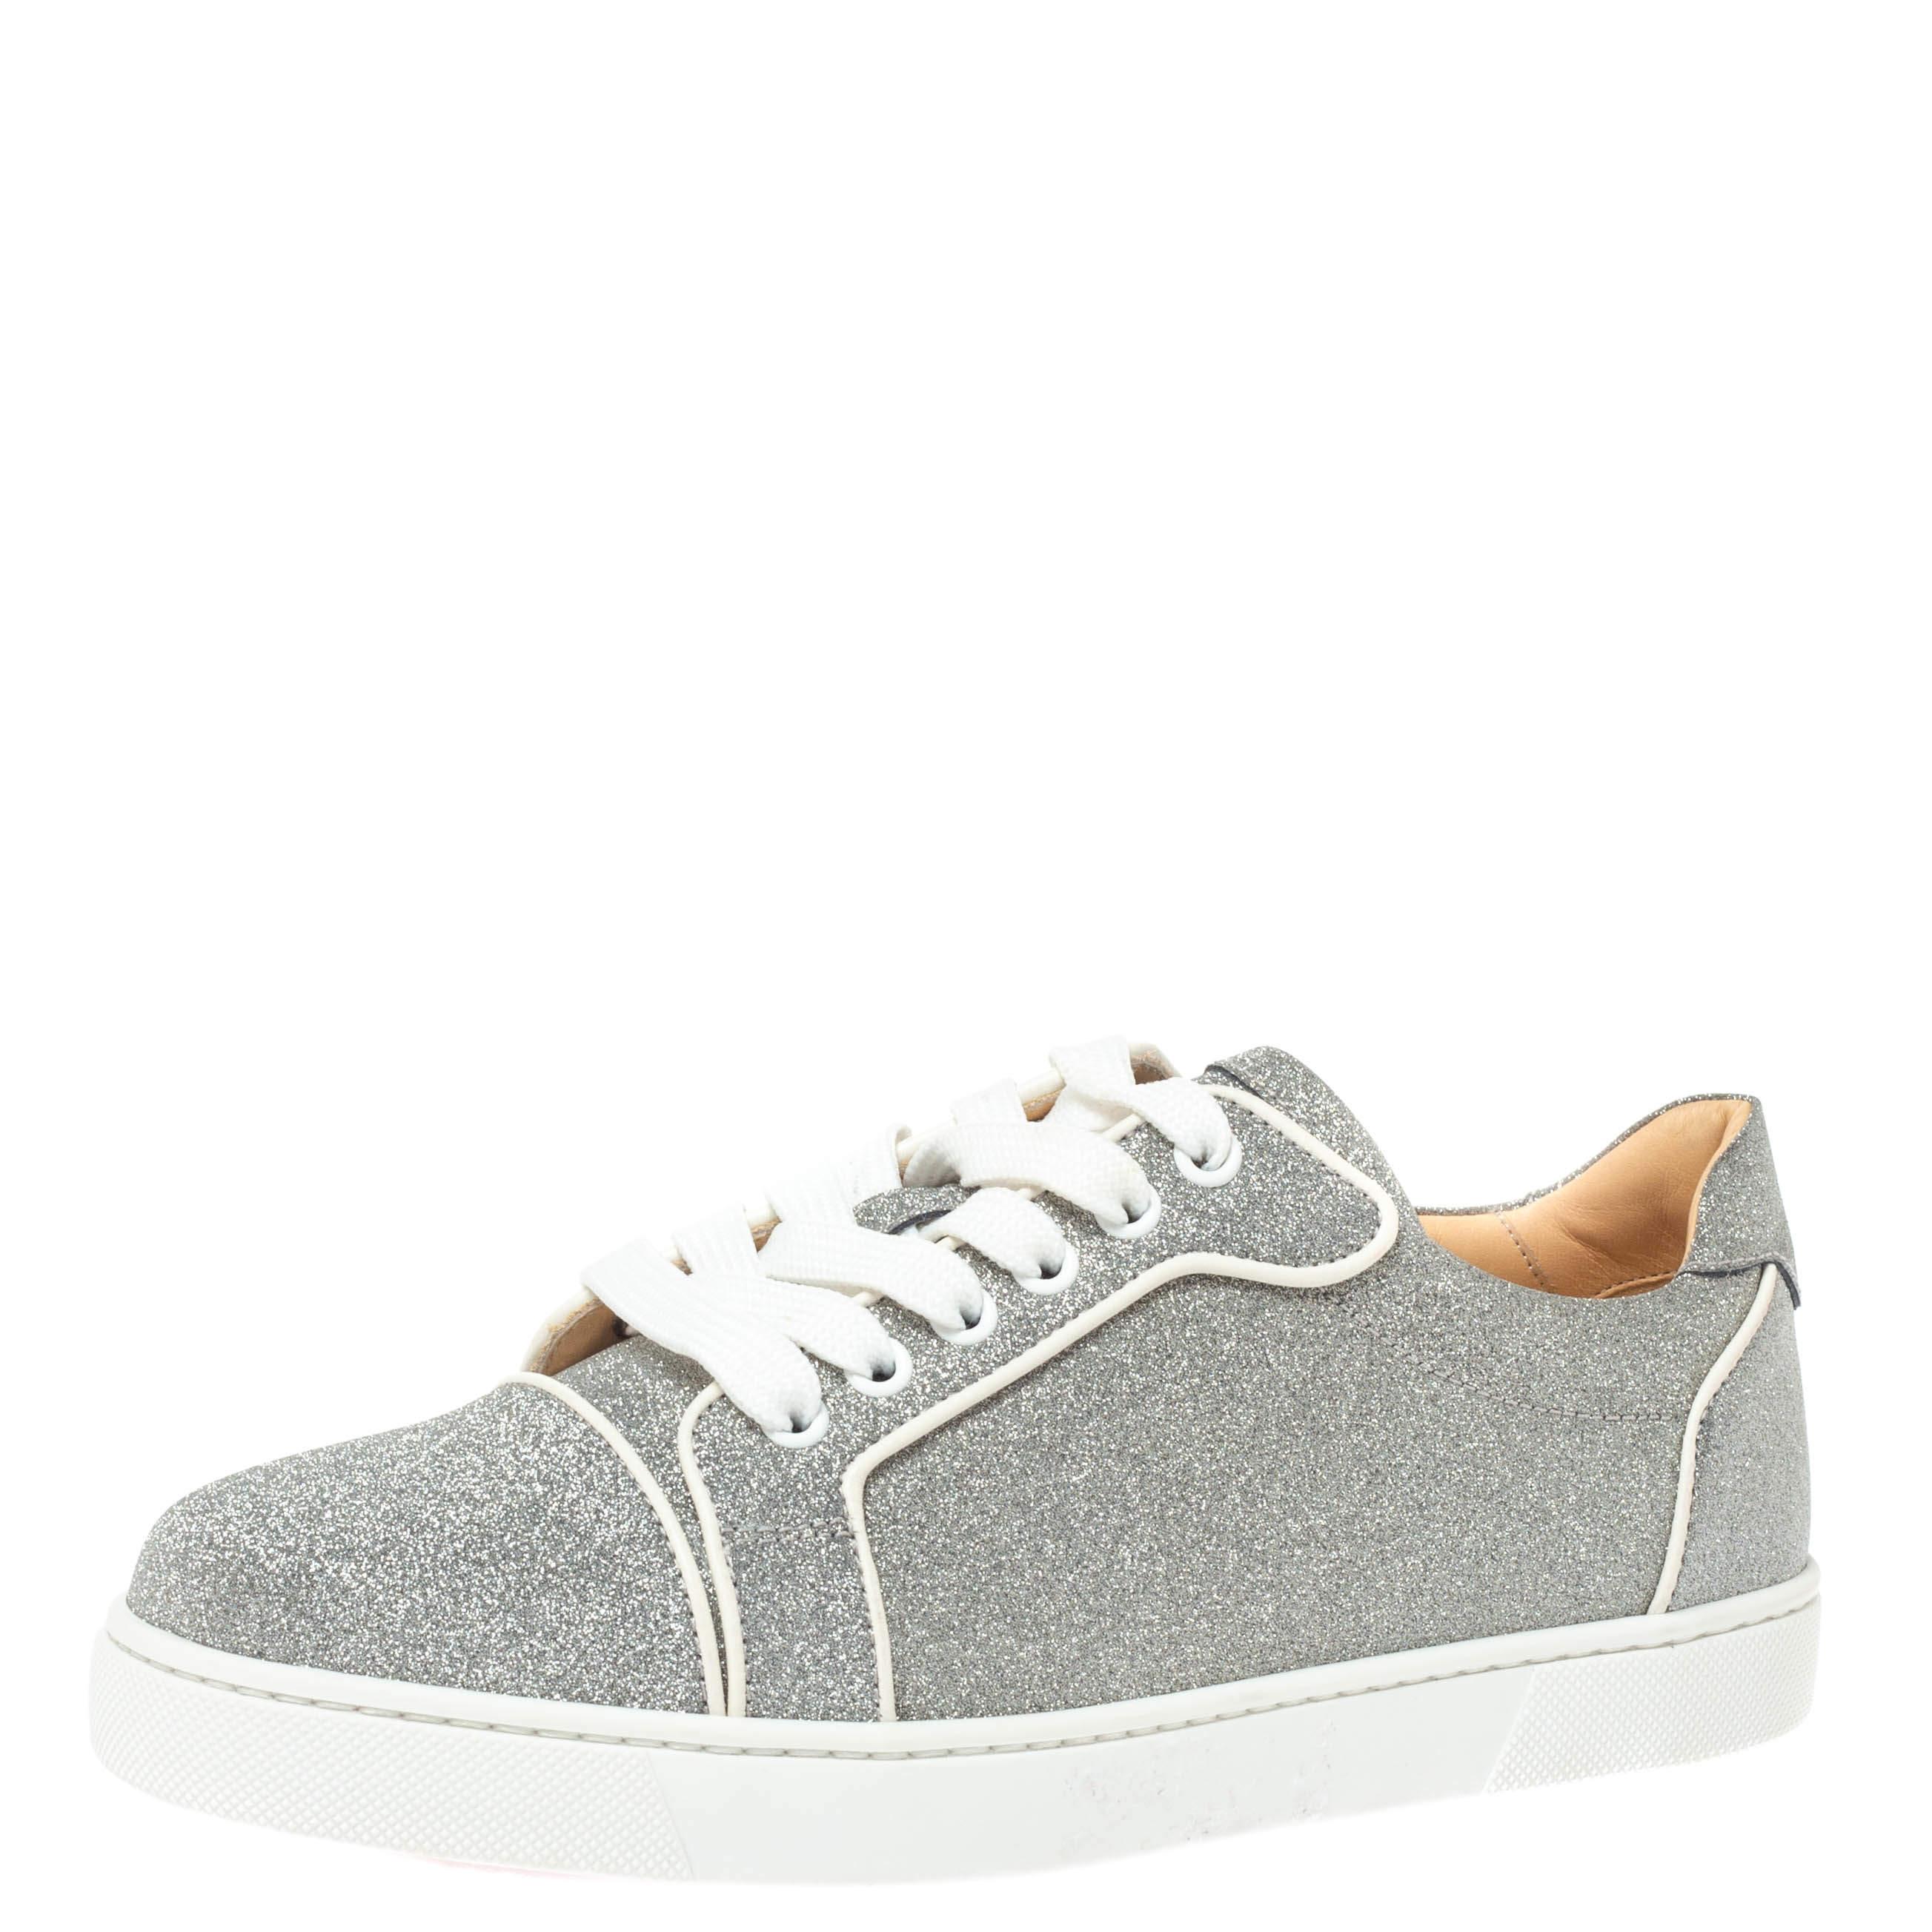 Christian Louboutin Silver Glitter Gondoliere Orlato Low Top Sneakers Size 38